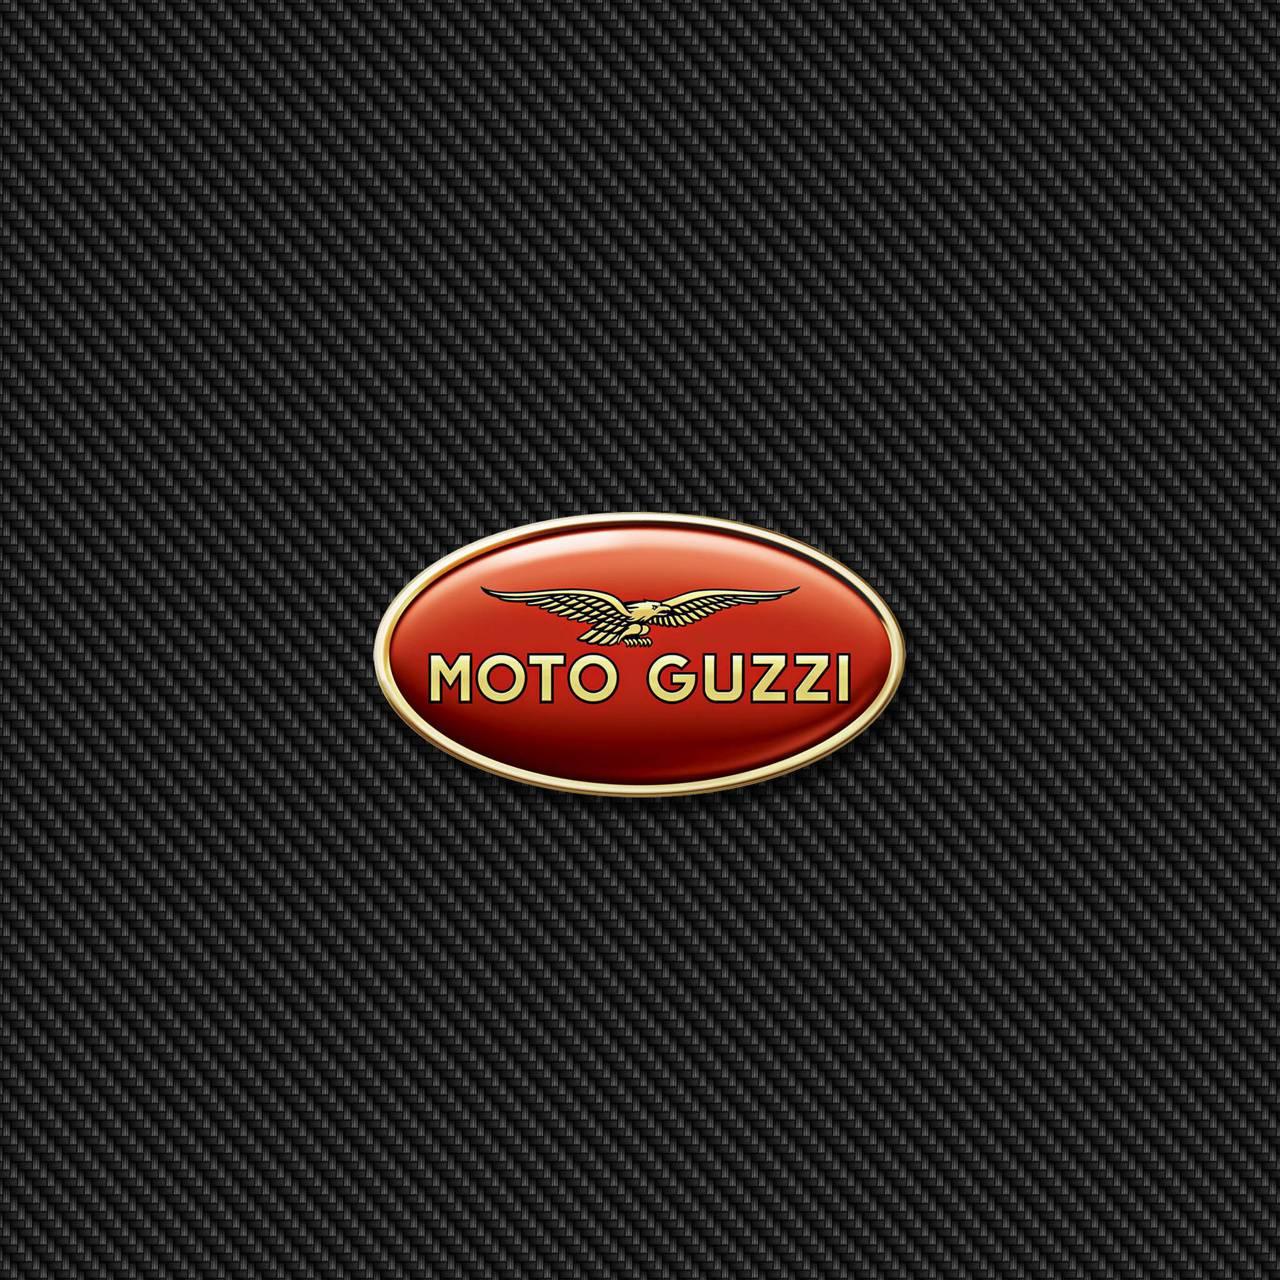 Moto Guzzi Carbon